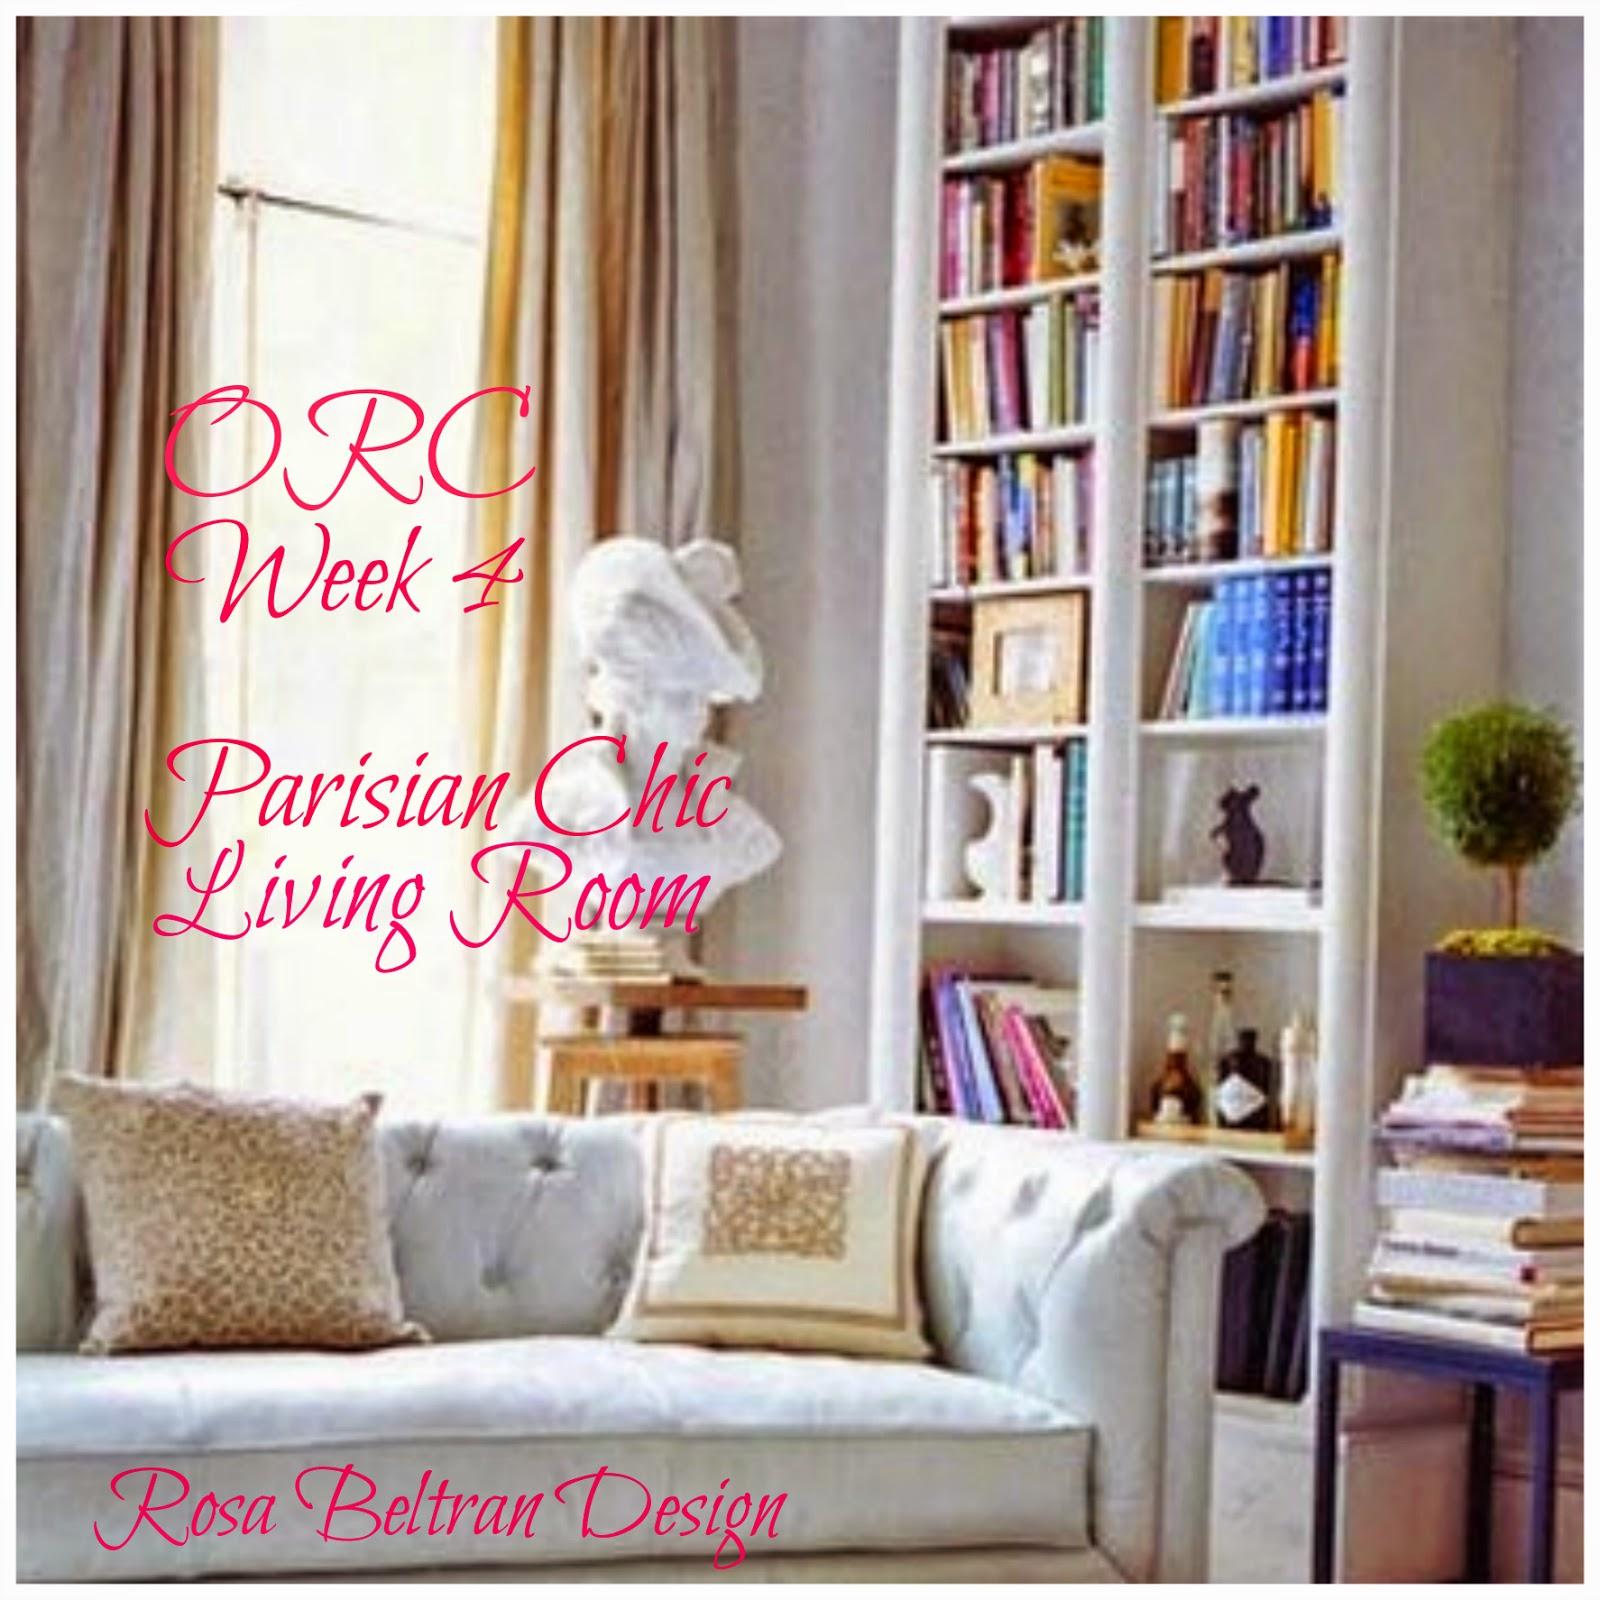 One Room Living Rosa Beltran Design One Room Challenge Parisian Chic Living Room